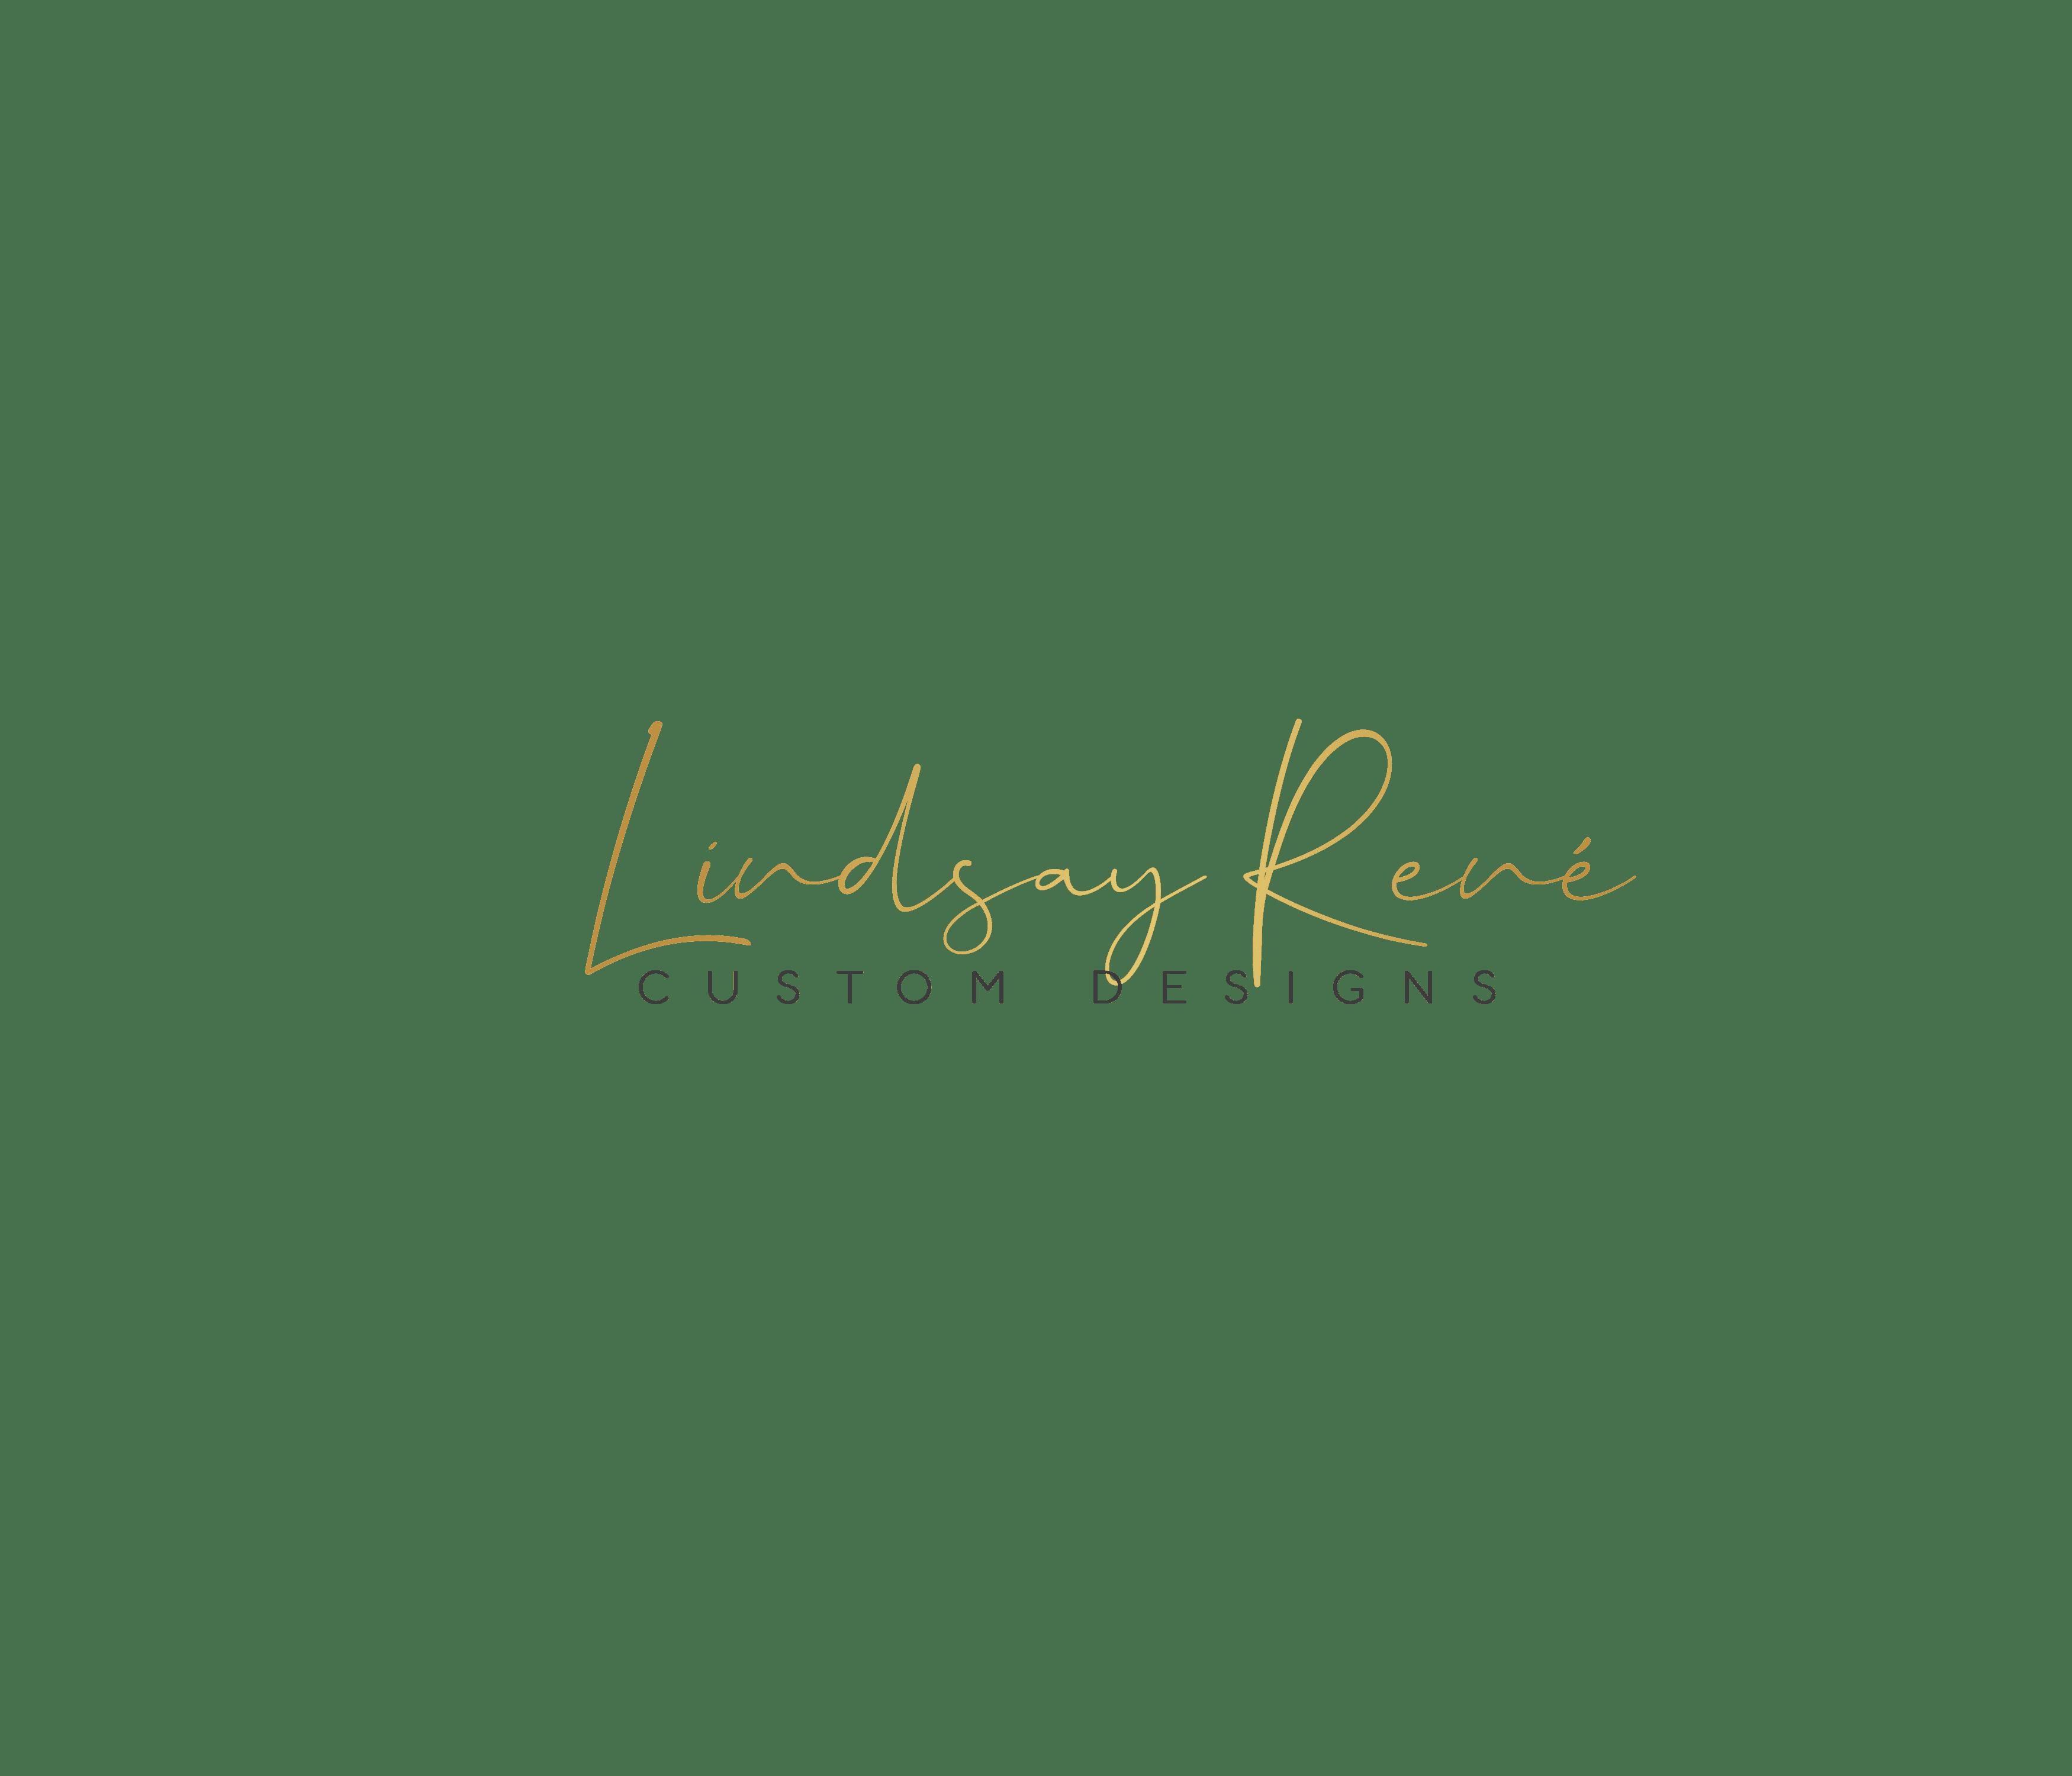 Lindsay René Custom Designs